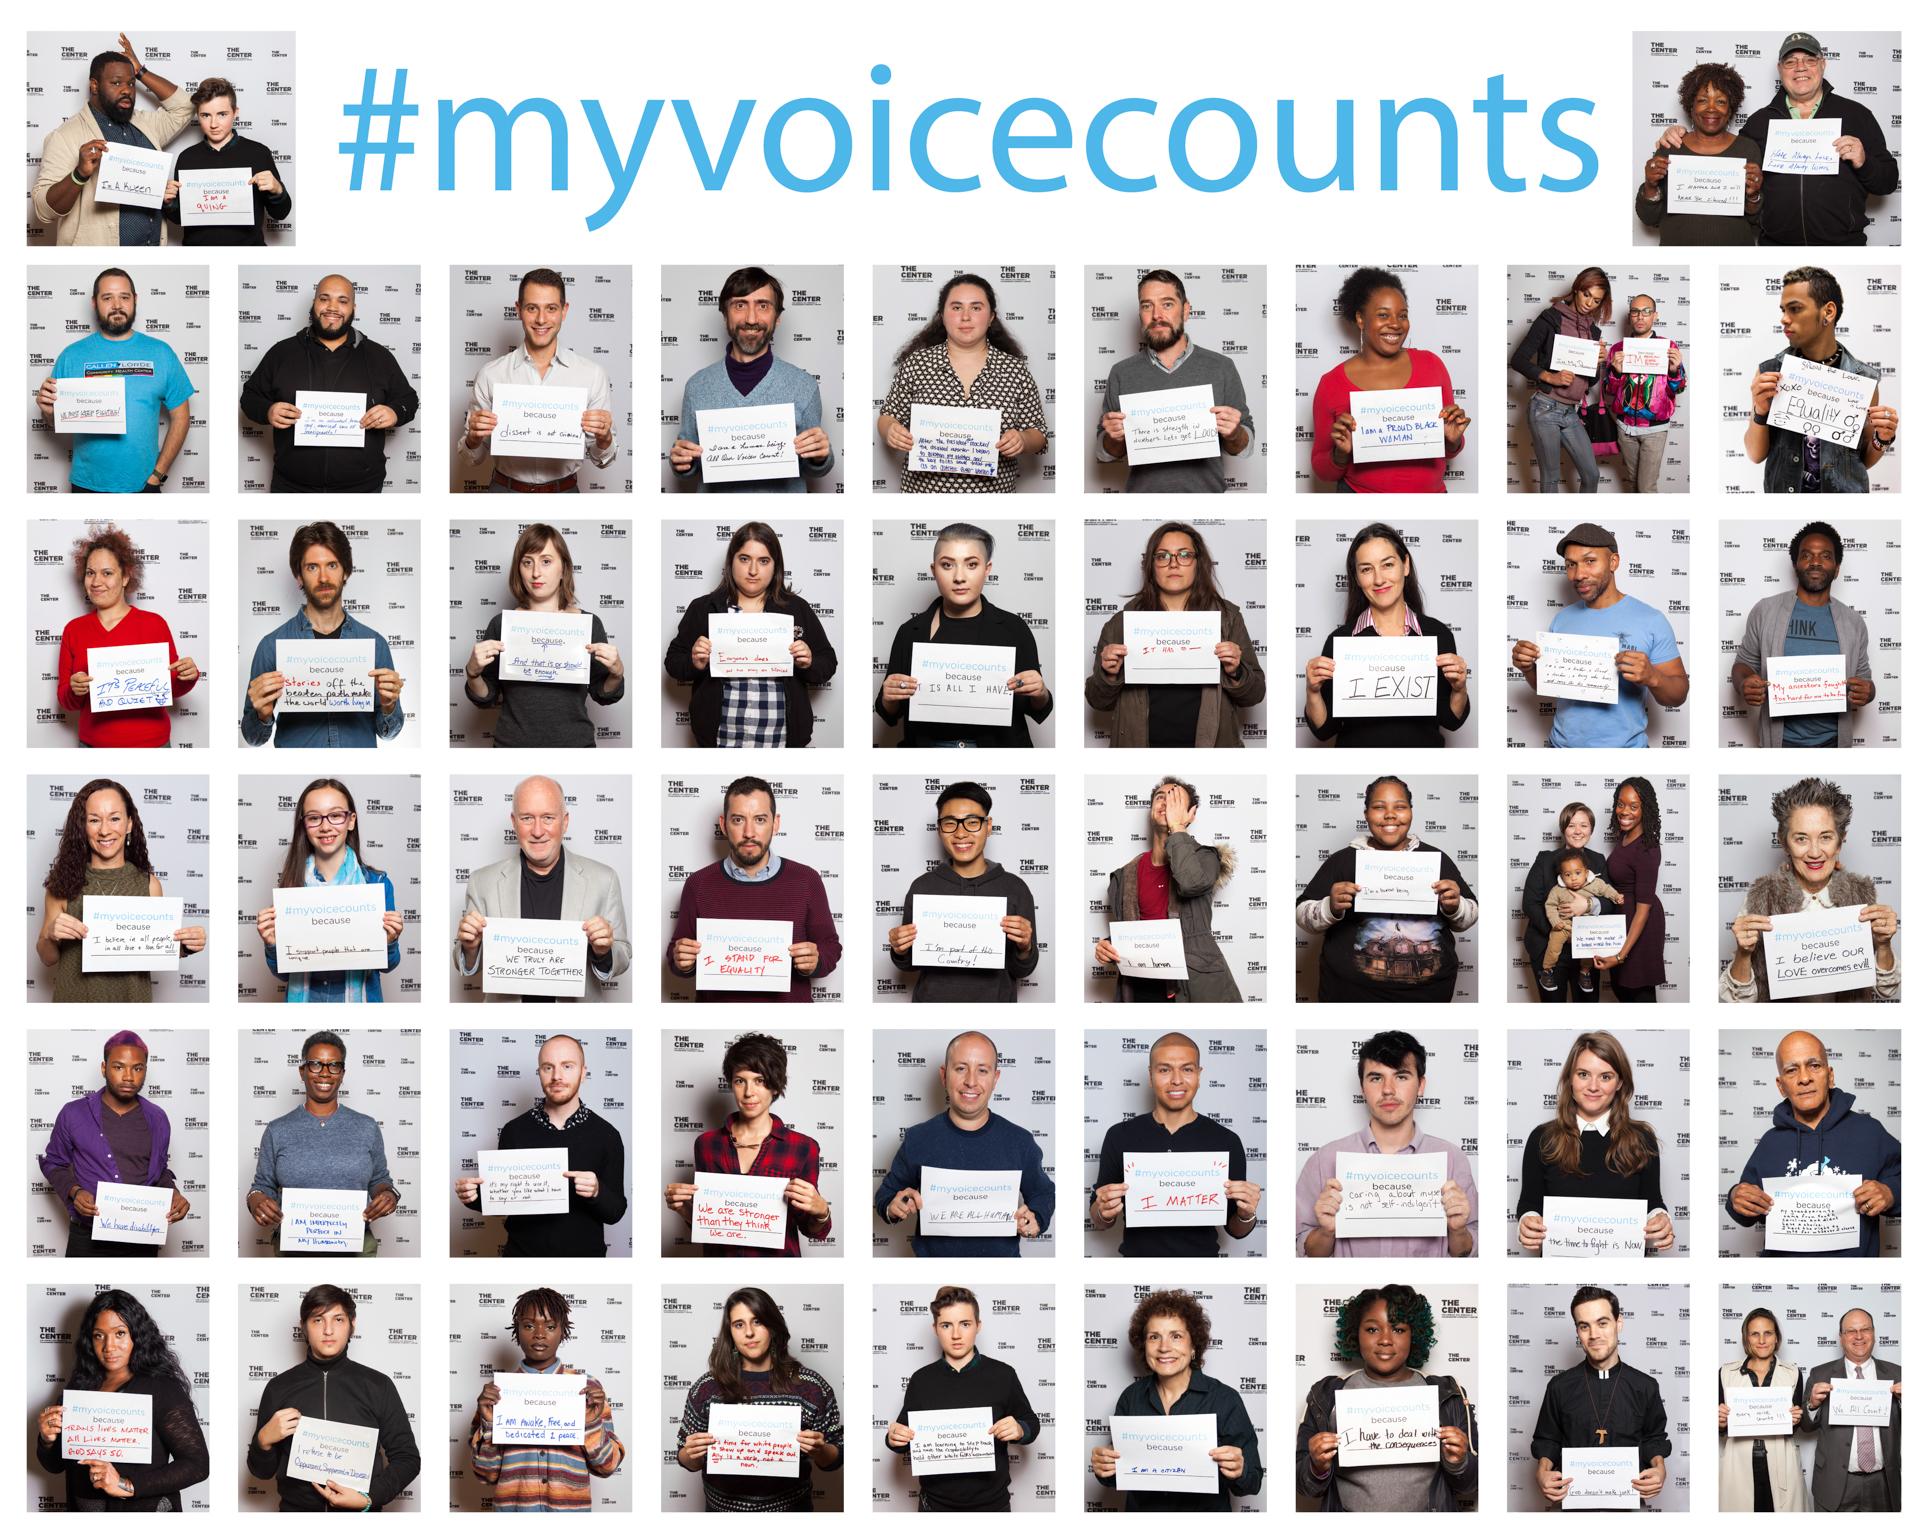 #myvoicecounts